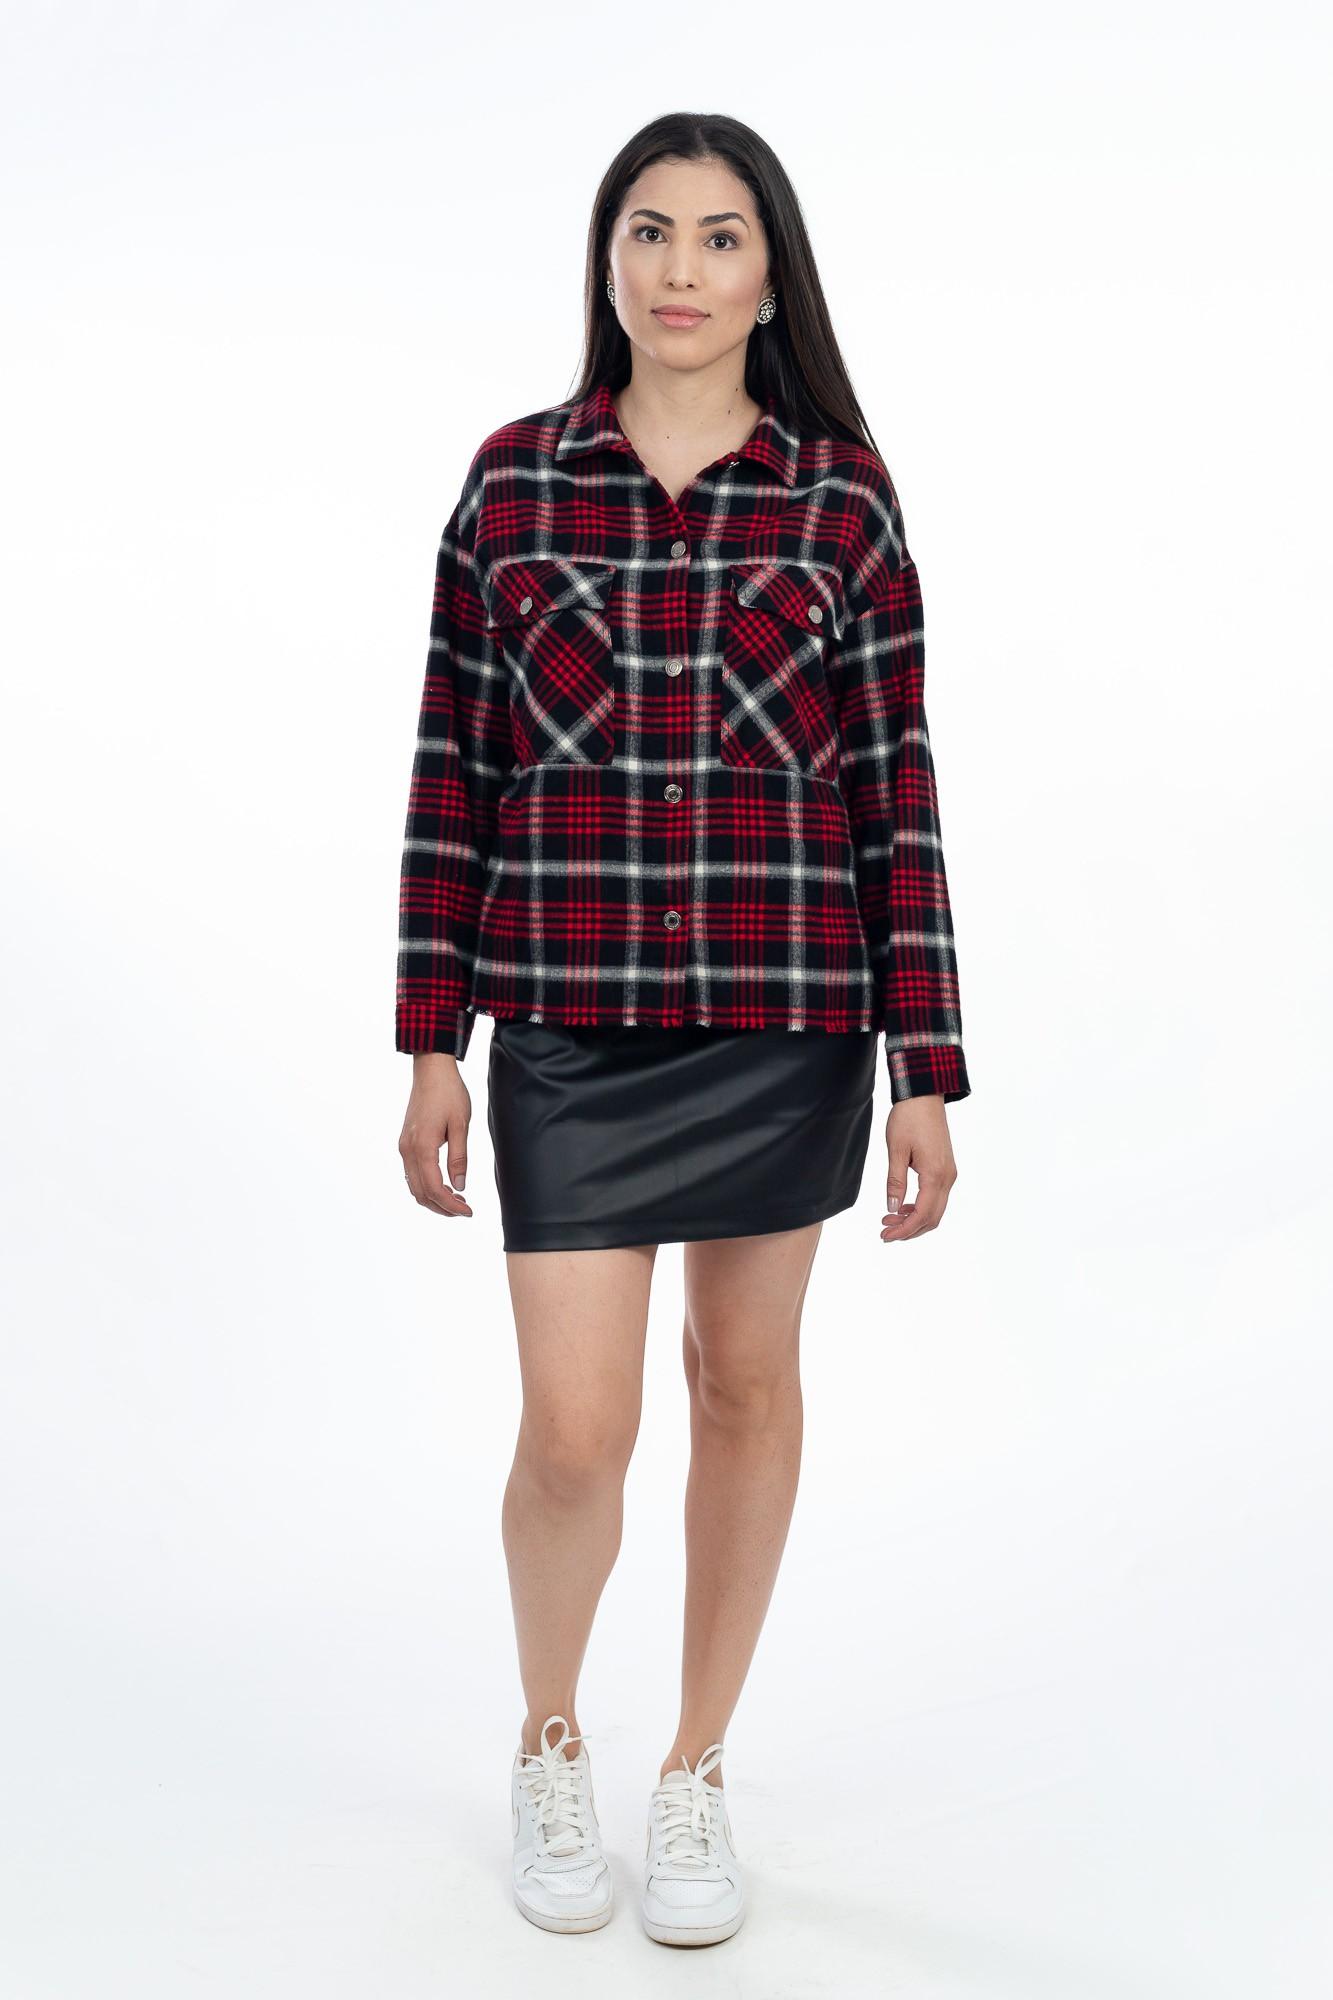 Camisa flanelada xadrez vermelha Zara tam P